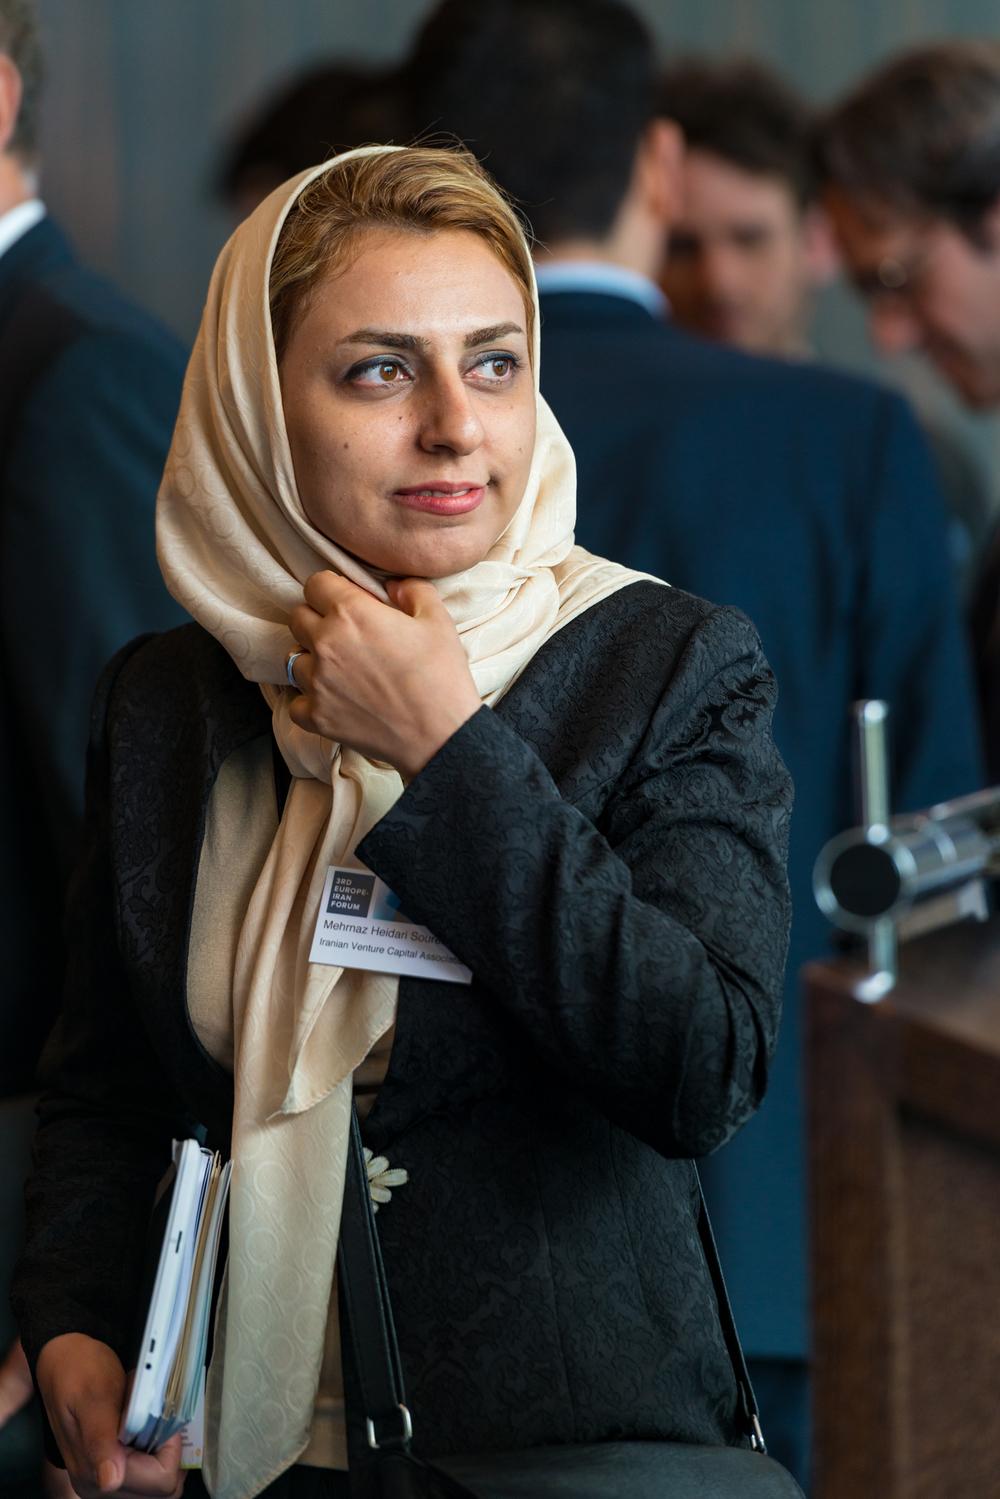 96.3rd Europe-Iran Forum_3.05.2016-Mai16.jpg